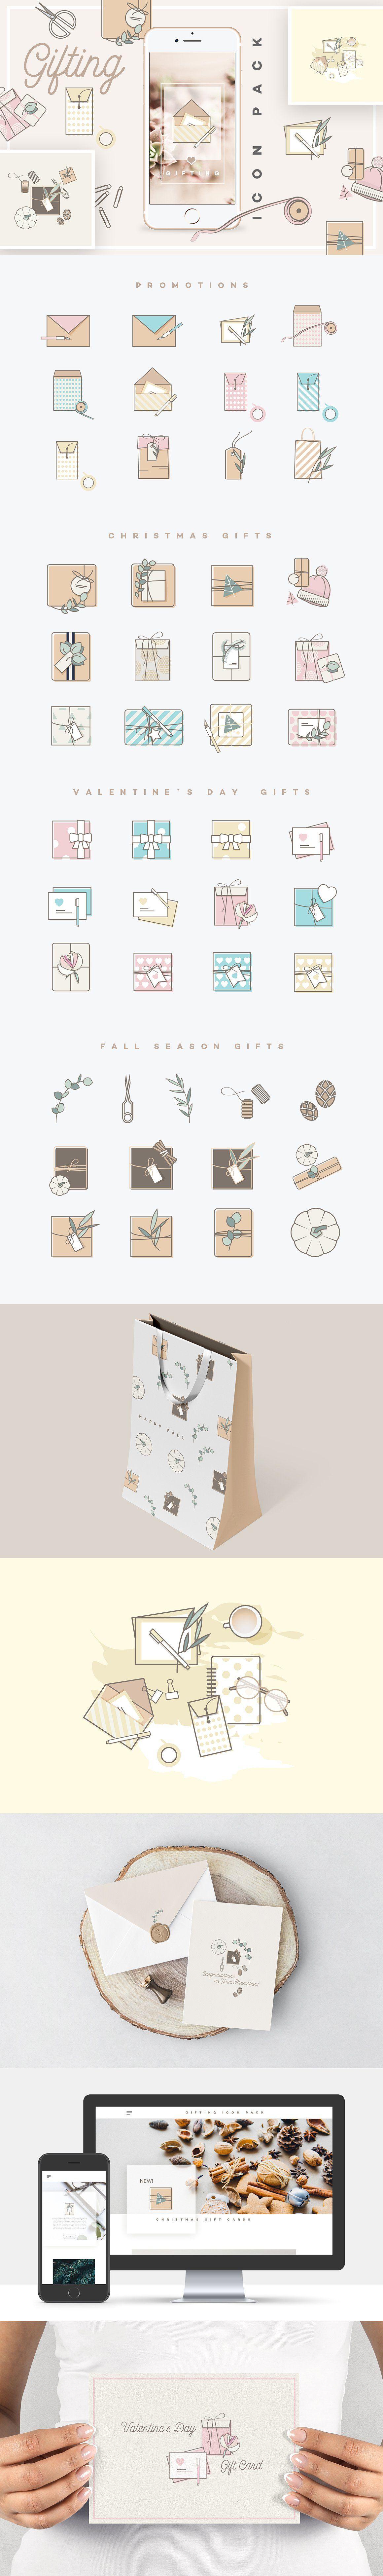 Gifting Icon Pack by Polar Vectors on @creativemarket  #ad #affiliatelink #affiliate #font #design #templates #blogger #blog #creative #feminine #girlboss #instagram #socialmedia